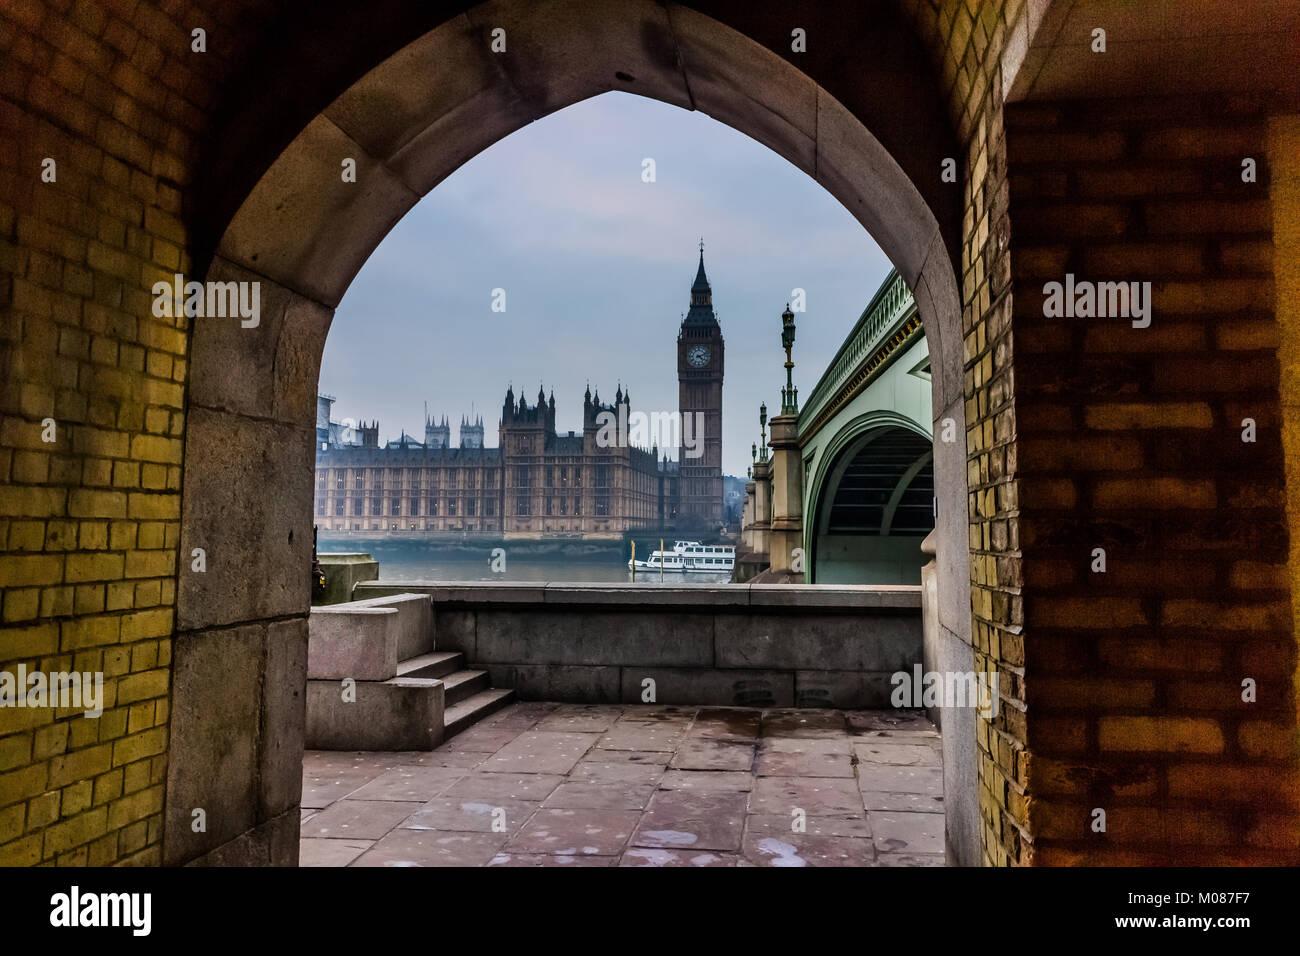 Houses of Parliament, Big Ben Stock Photo